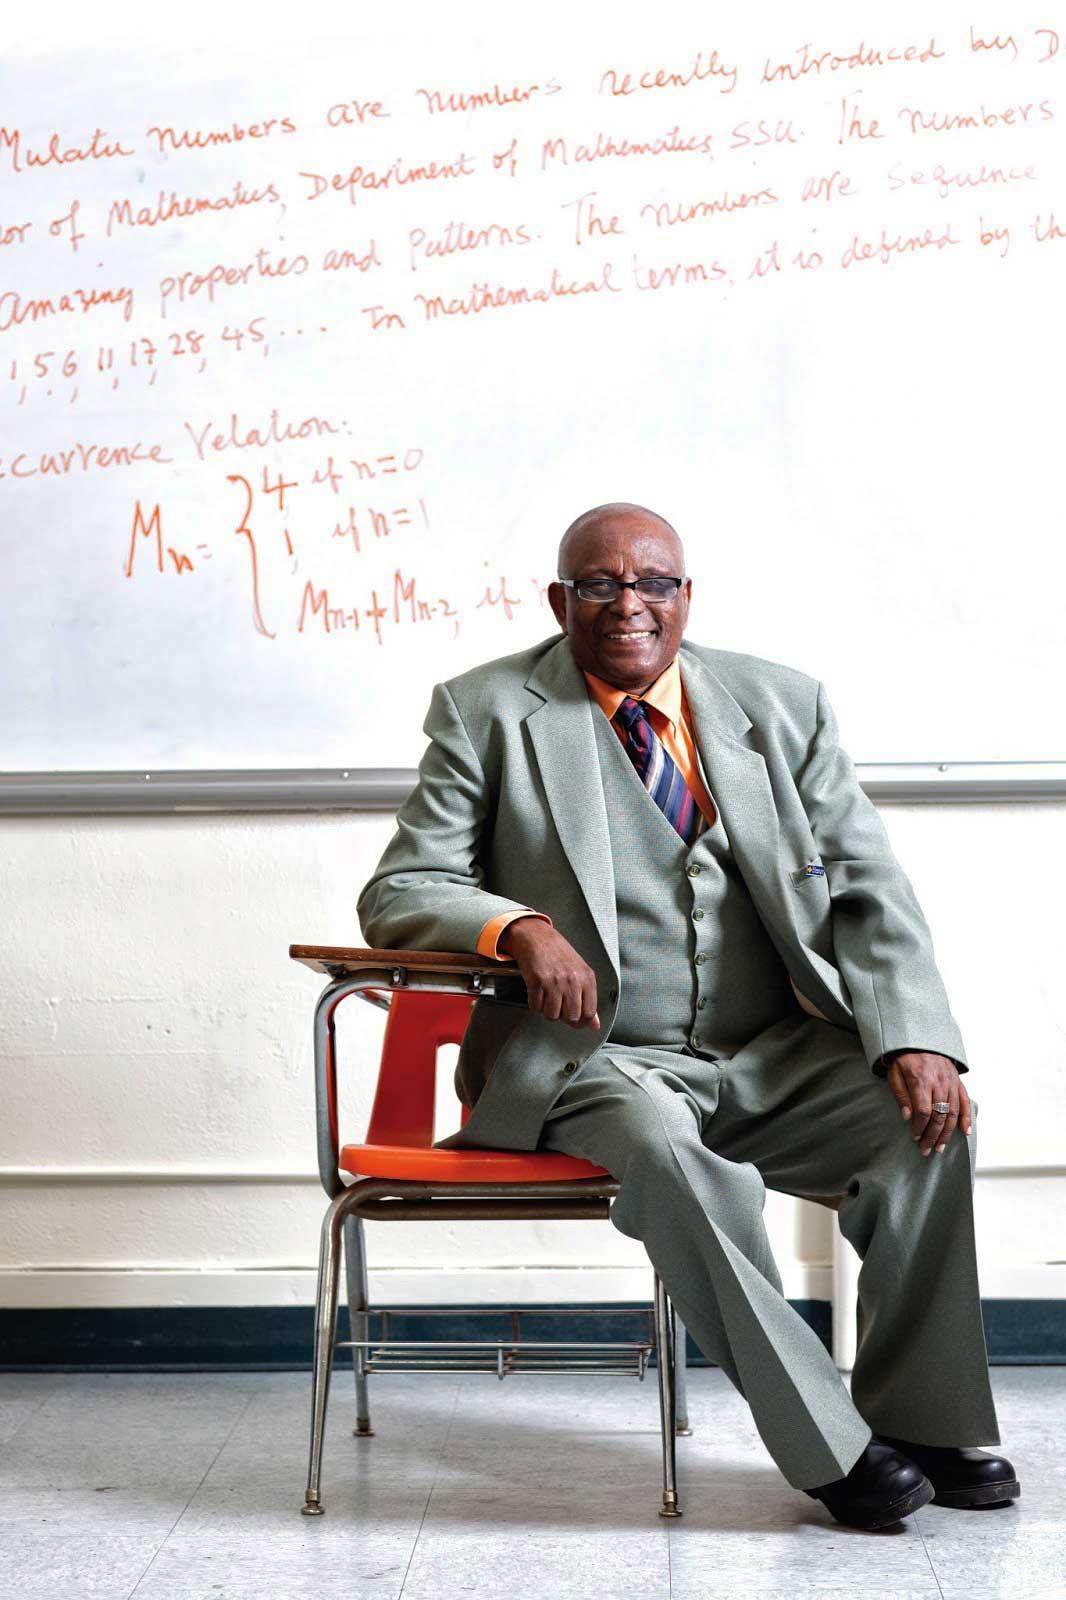 Ethio-American math professor receives presidential award - The Reporter Magazine | Ethiopian Magazine